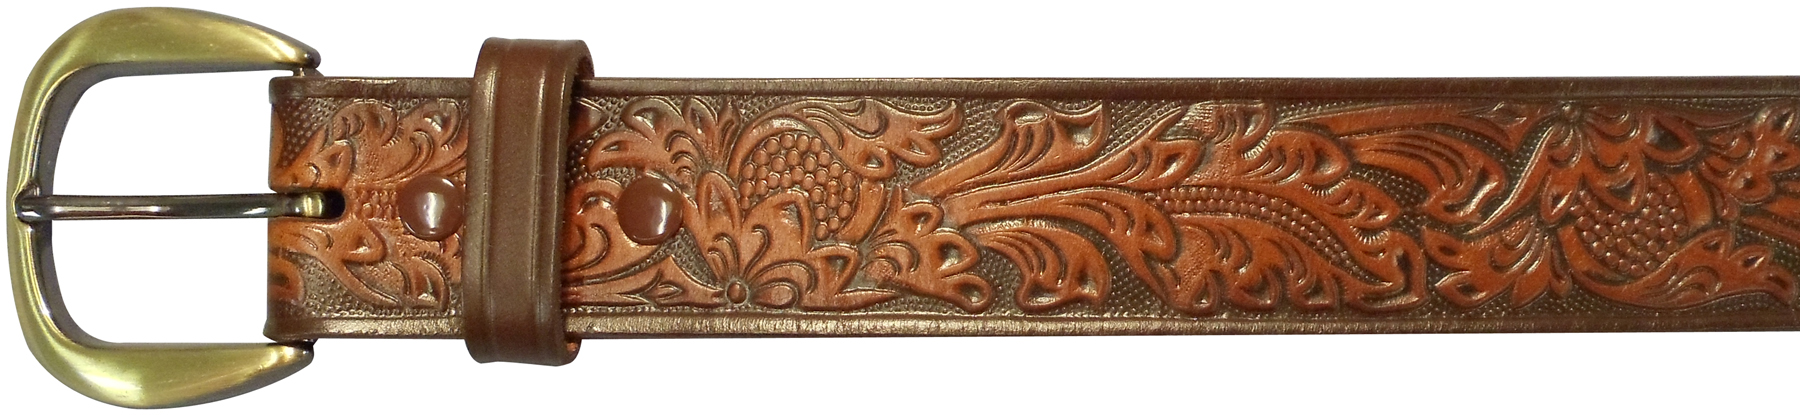 "10610110242 - 42"" Brown Leather Field & Stream Embossed Belt"